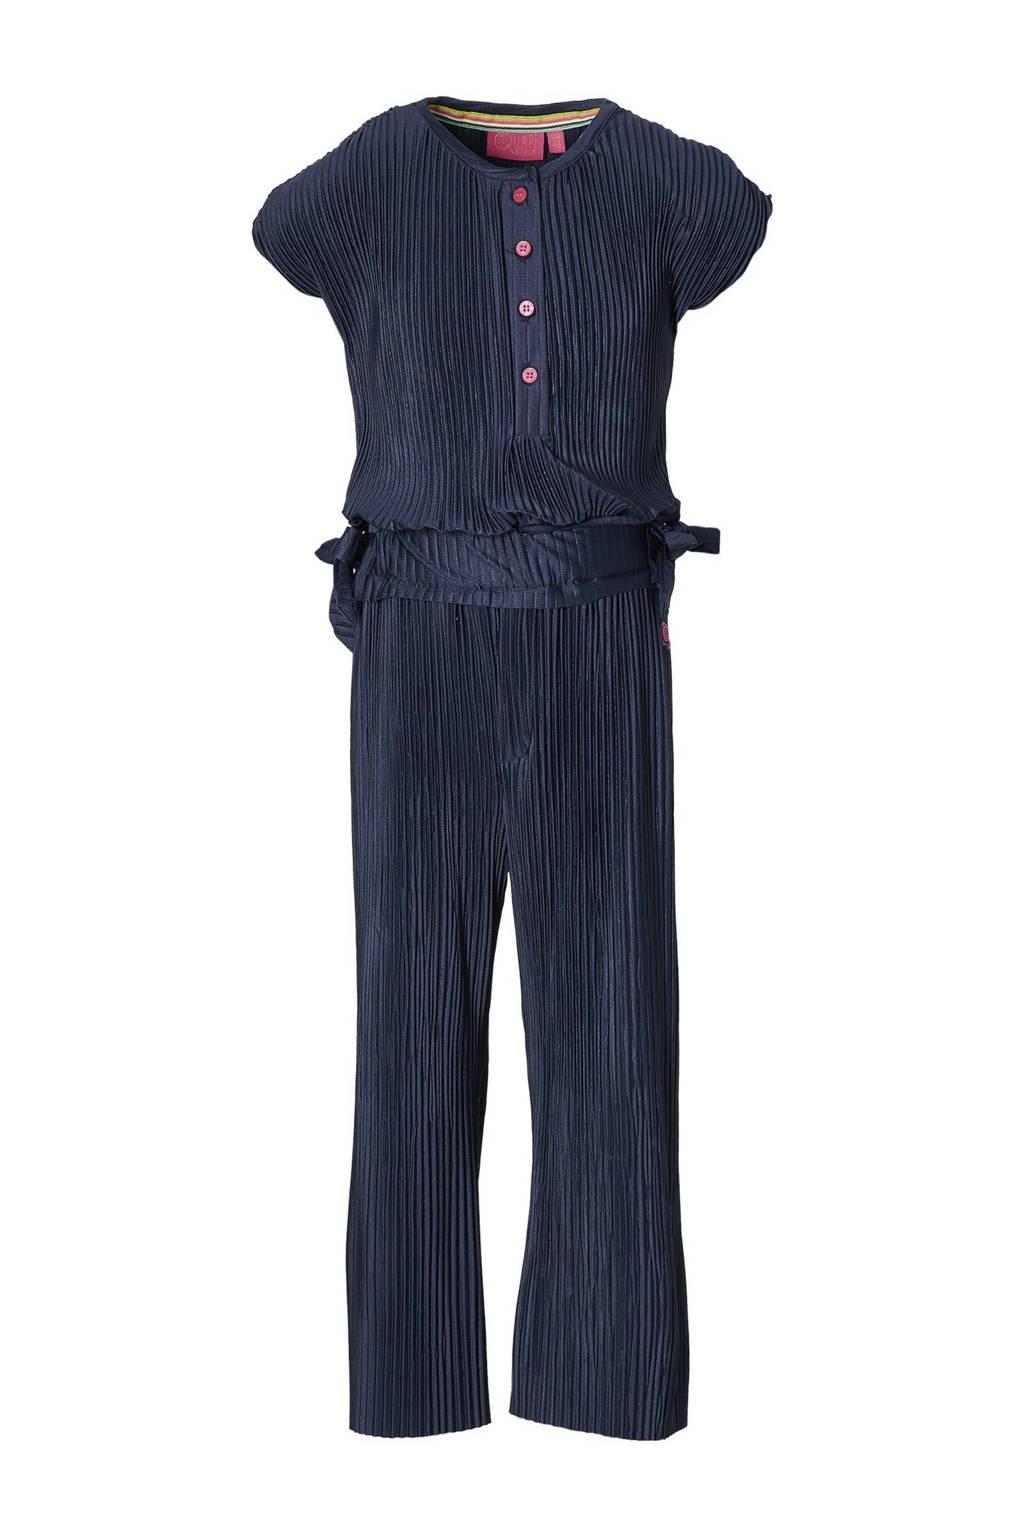 Quapi Girls gestreepte jumpsuit Farola donkerblauw, Donkerblauw